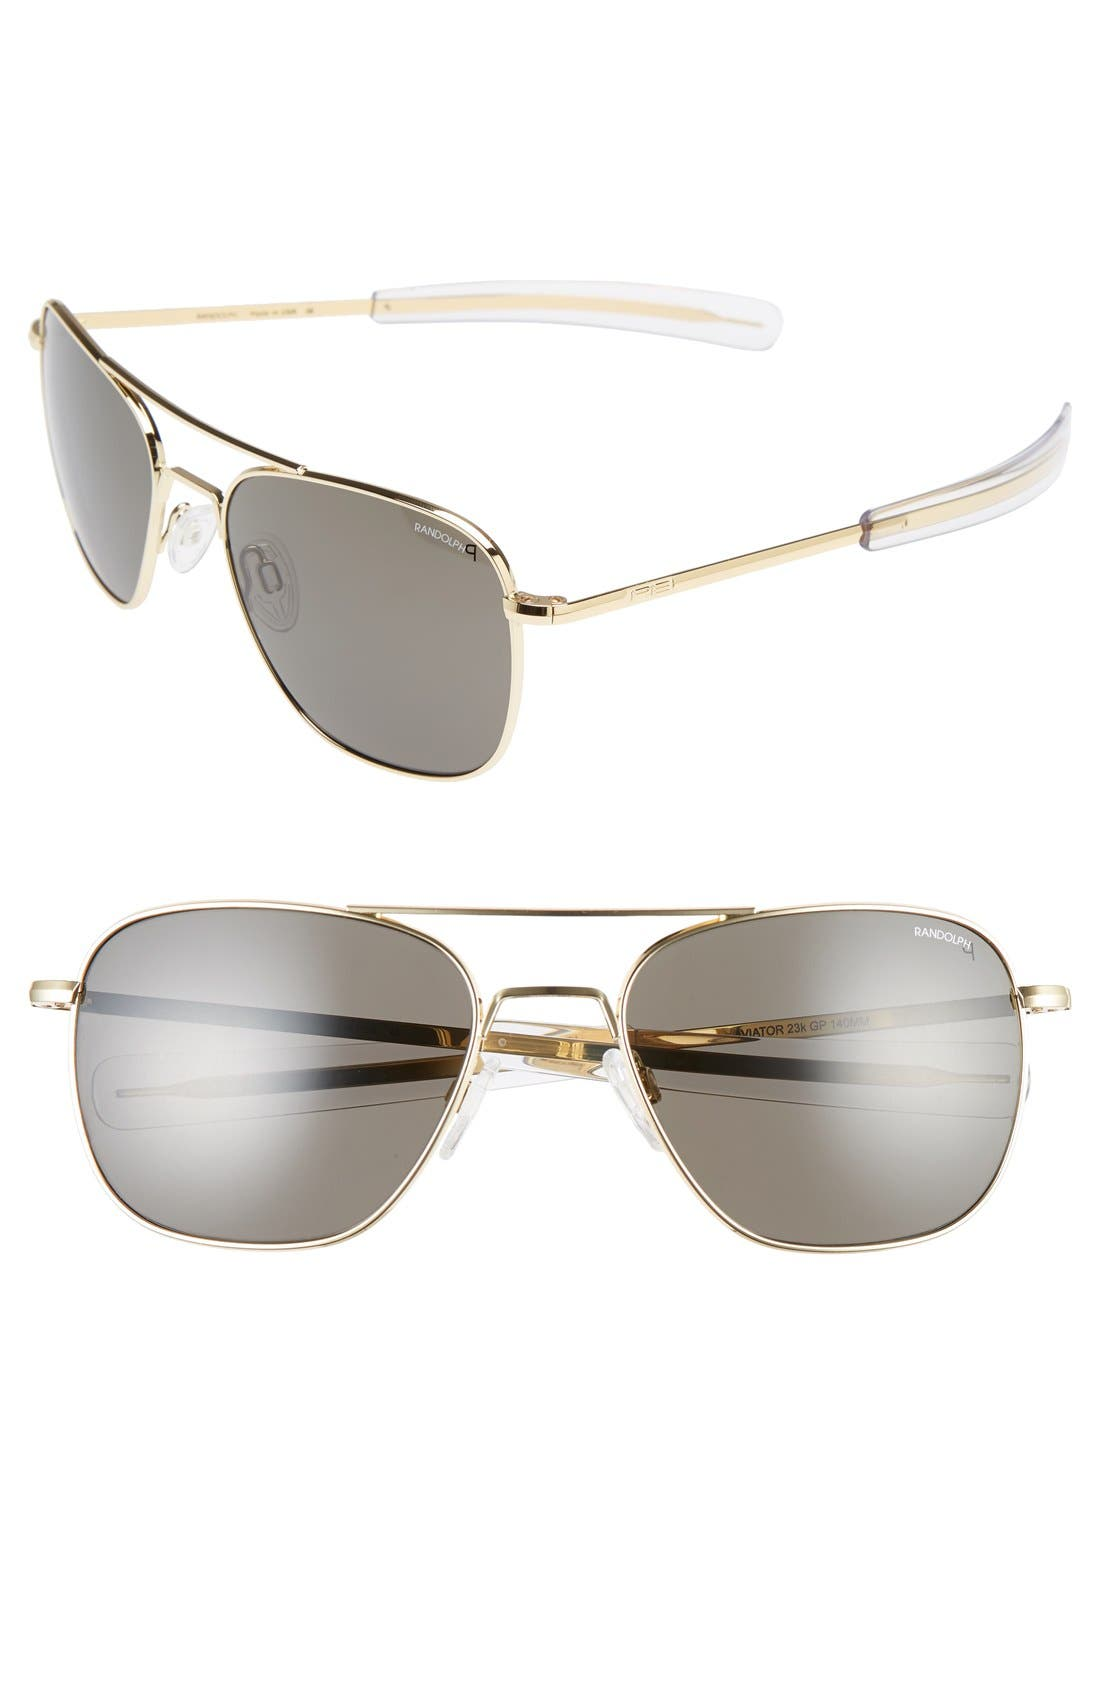 58mm Polarized Aviator Sunglasses,                         Main,                         color, 711